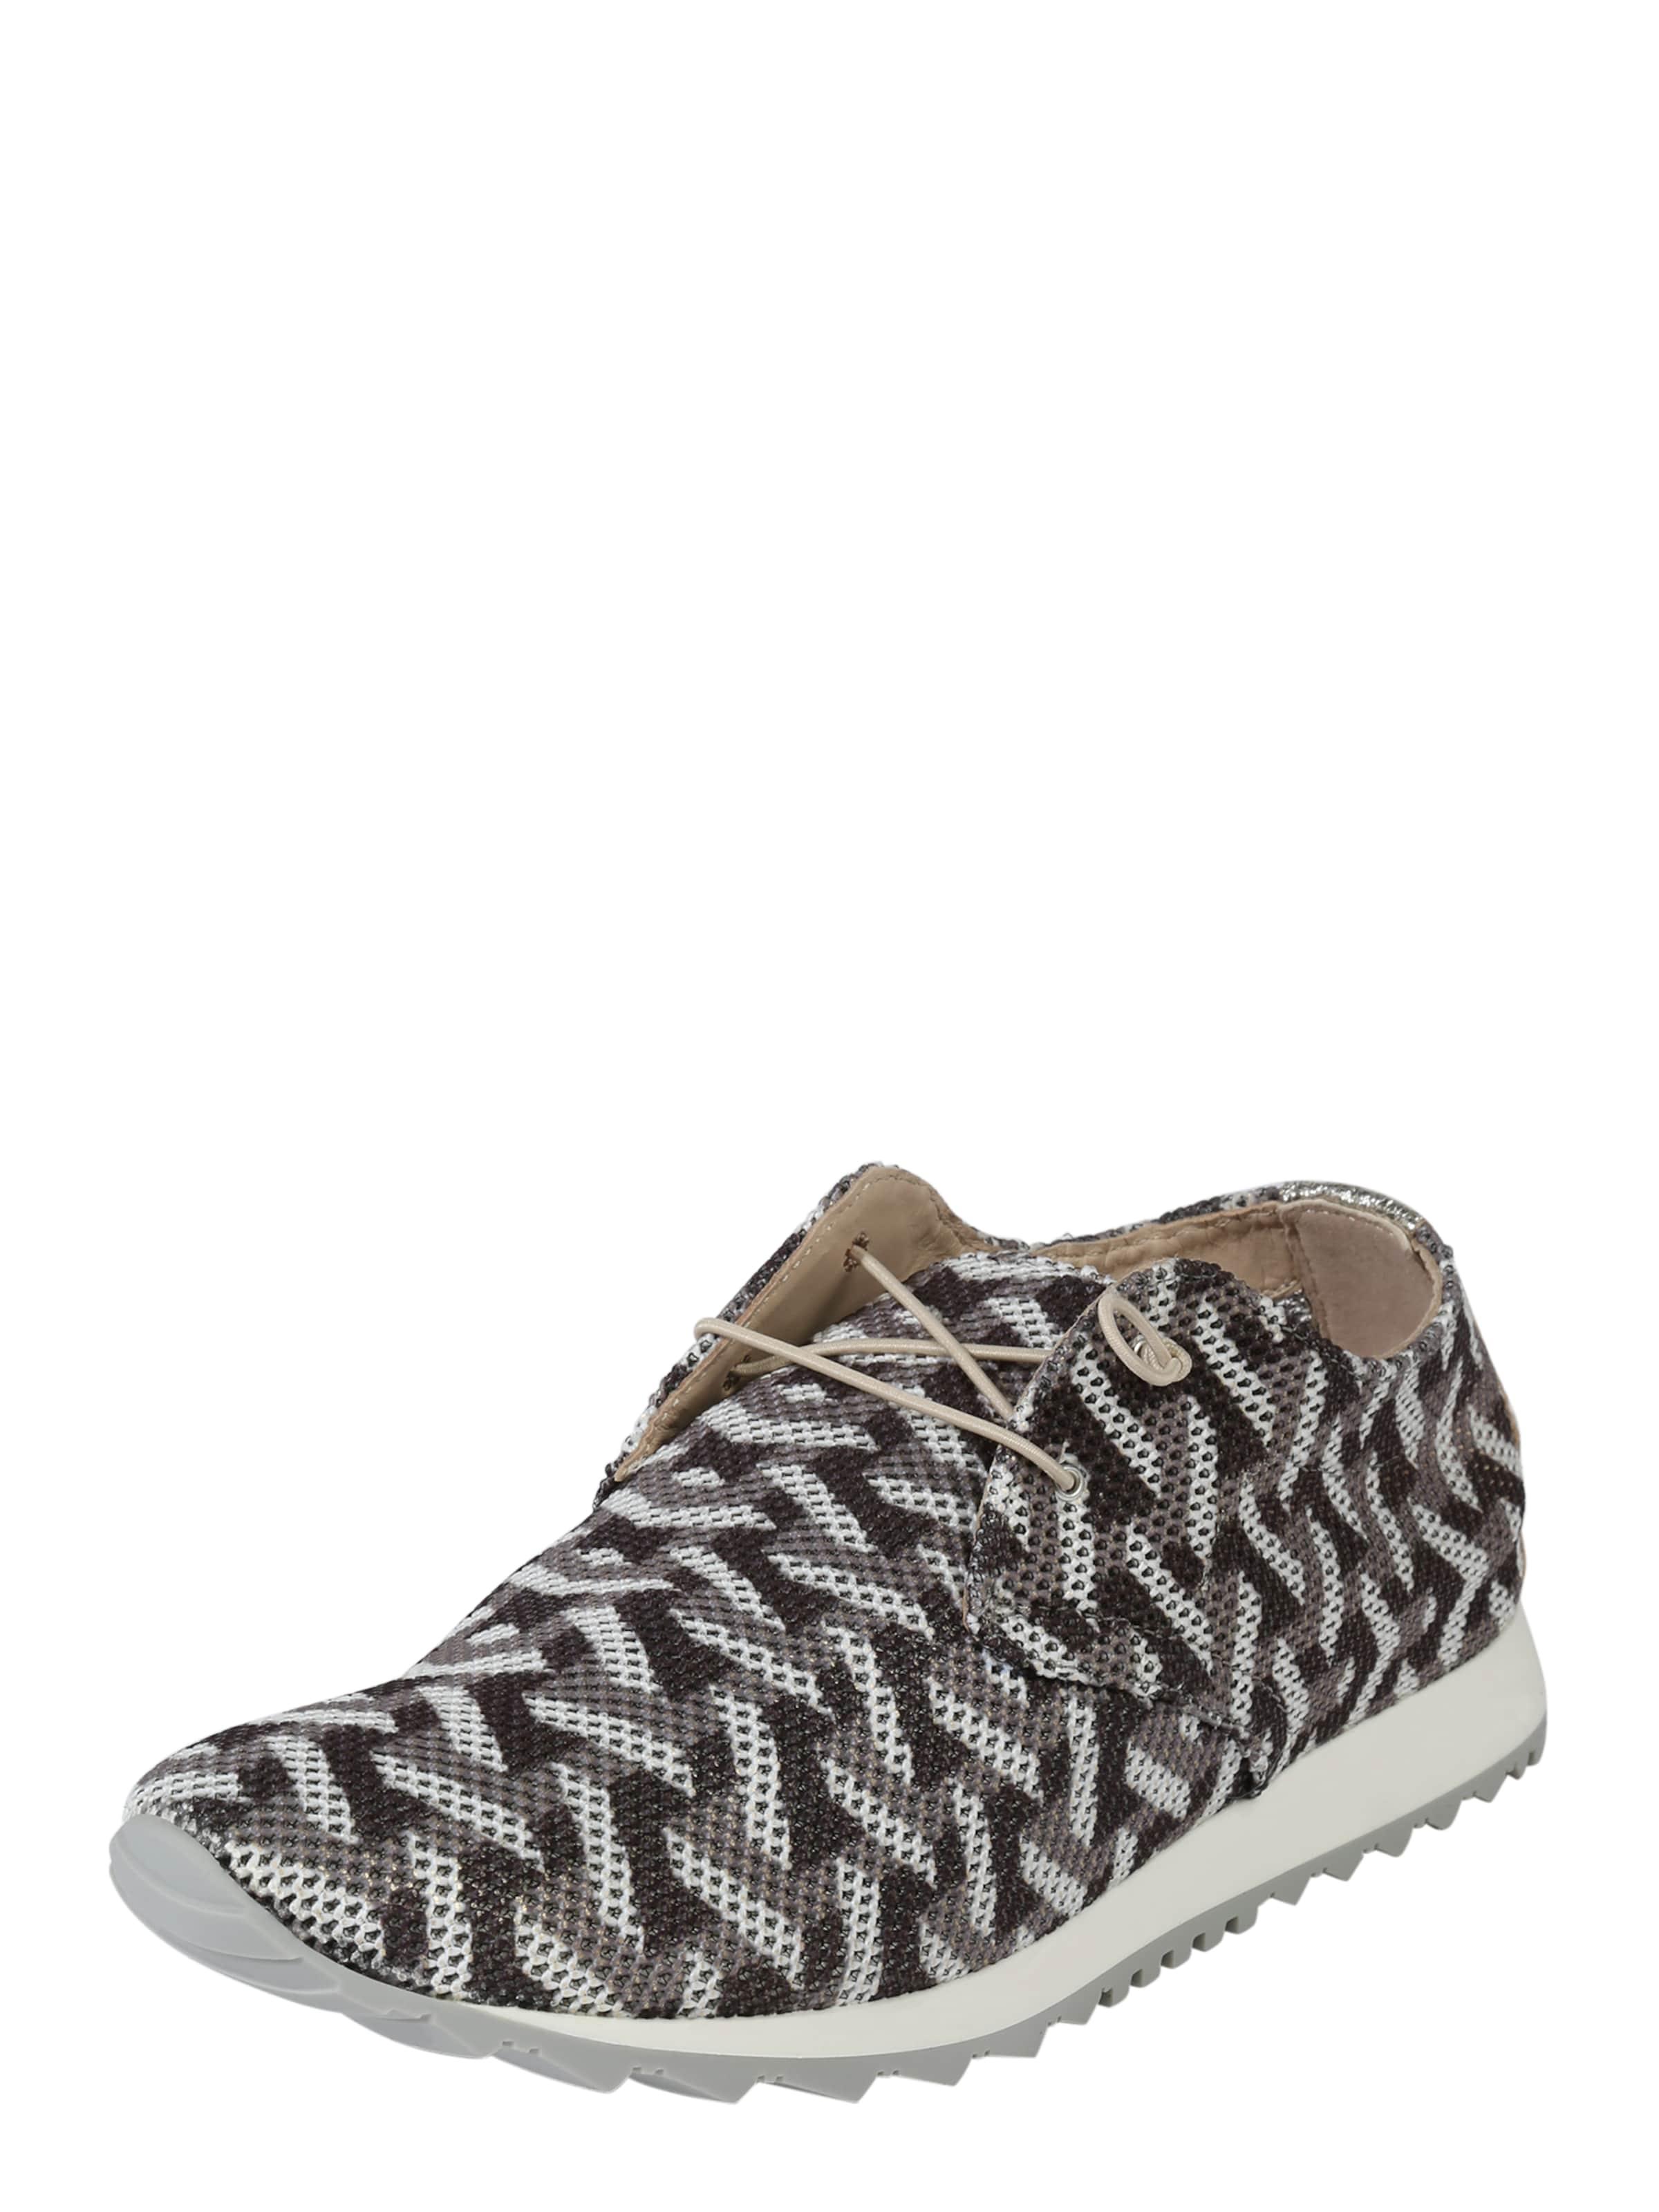 Haltbare Mode billige Schuhe Donna Carolina | Schnürer 'Gotik' Schuhe Gut getragene Schuhe